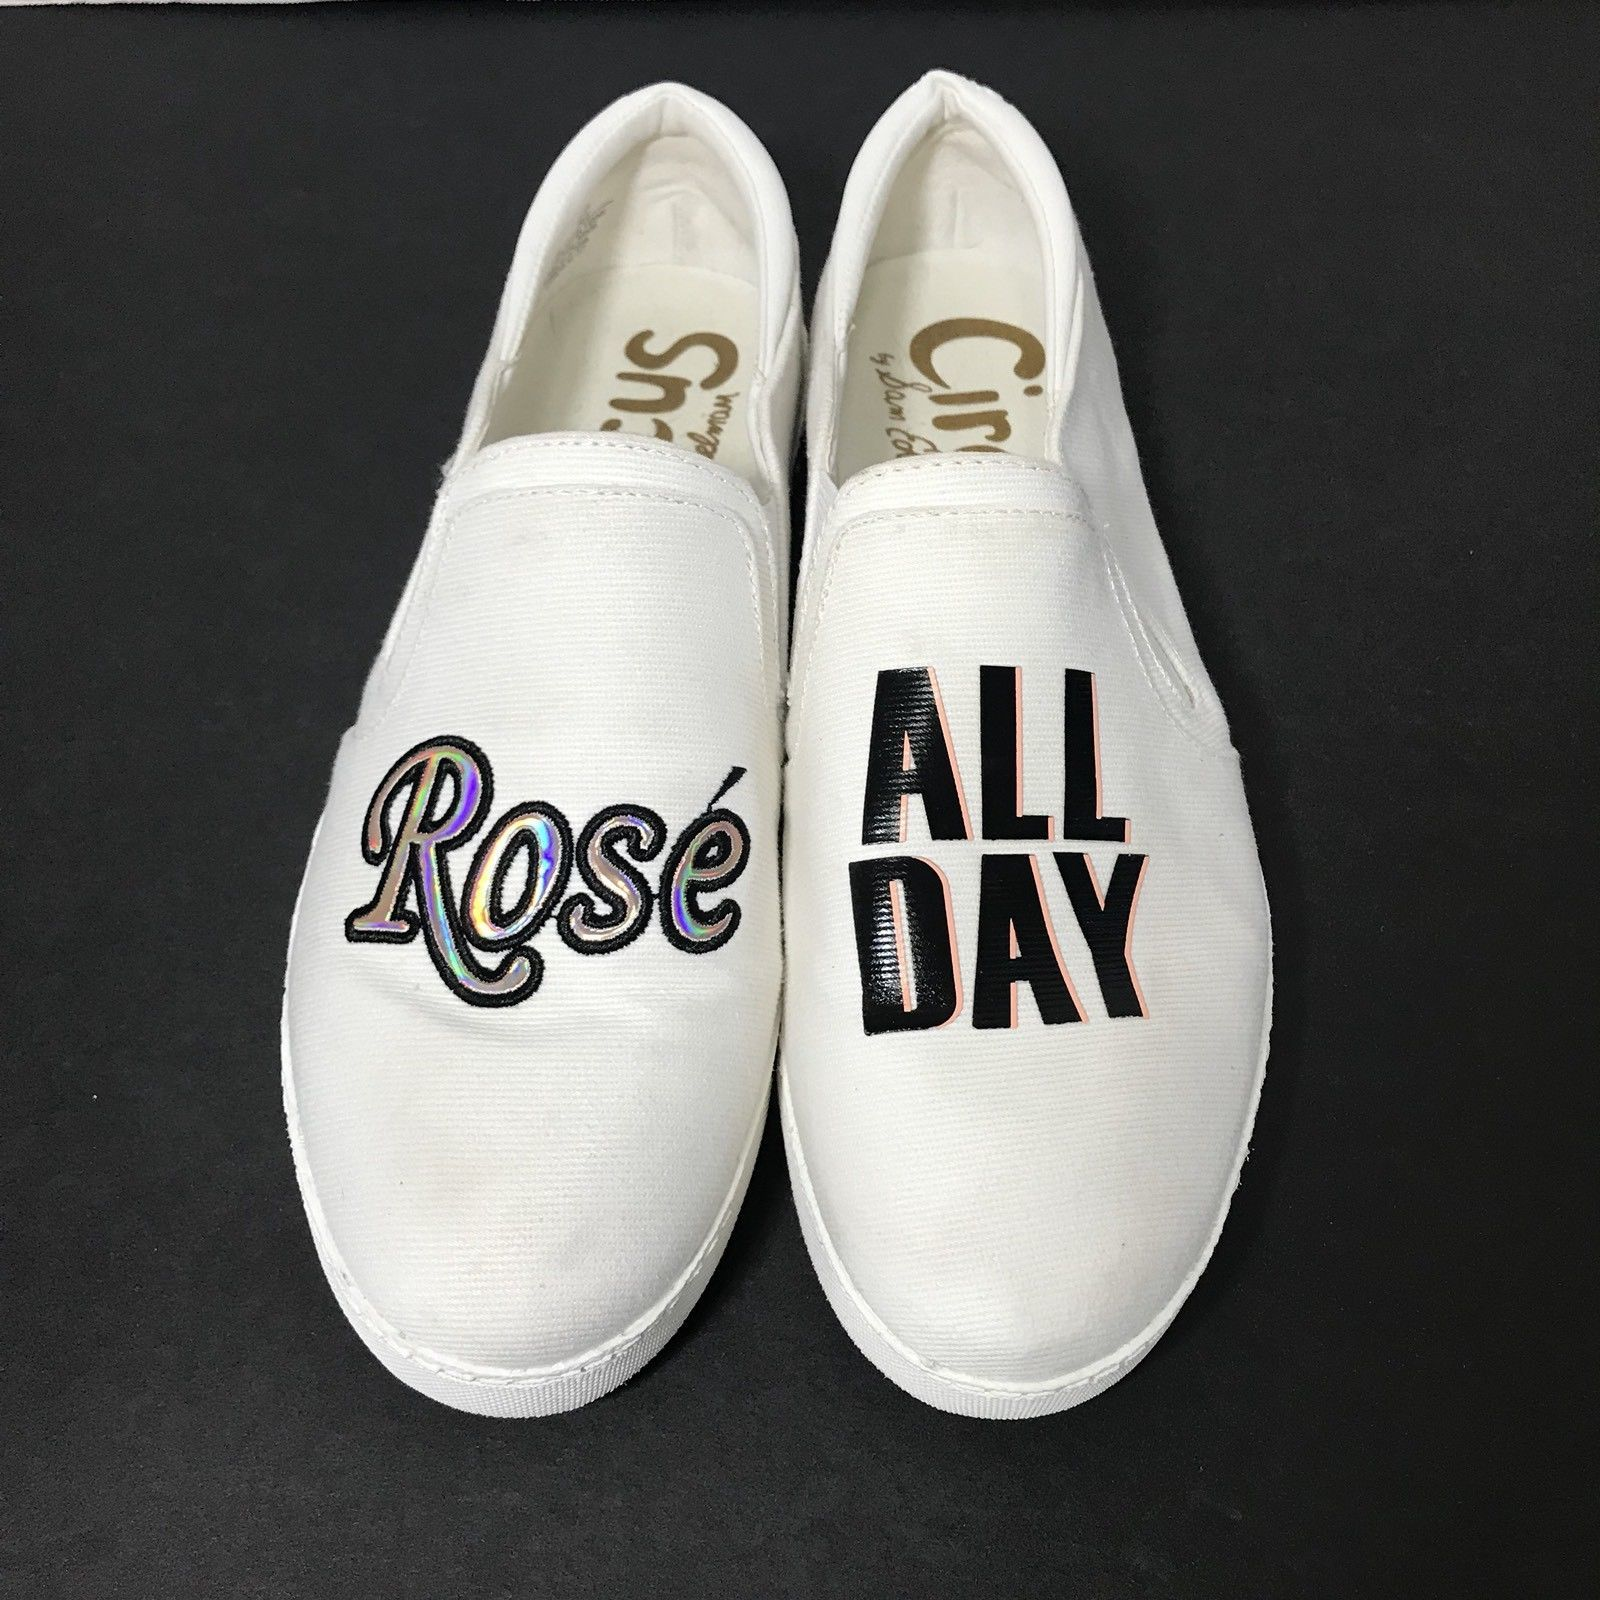 20b887ada Sam Edelman Circus Women s White Canvas Deck Shoes Size 8.5 Rose  All Day -   29.99